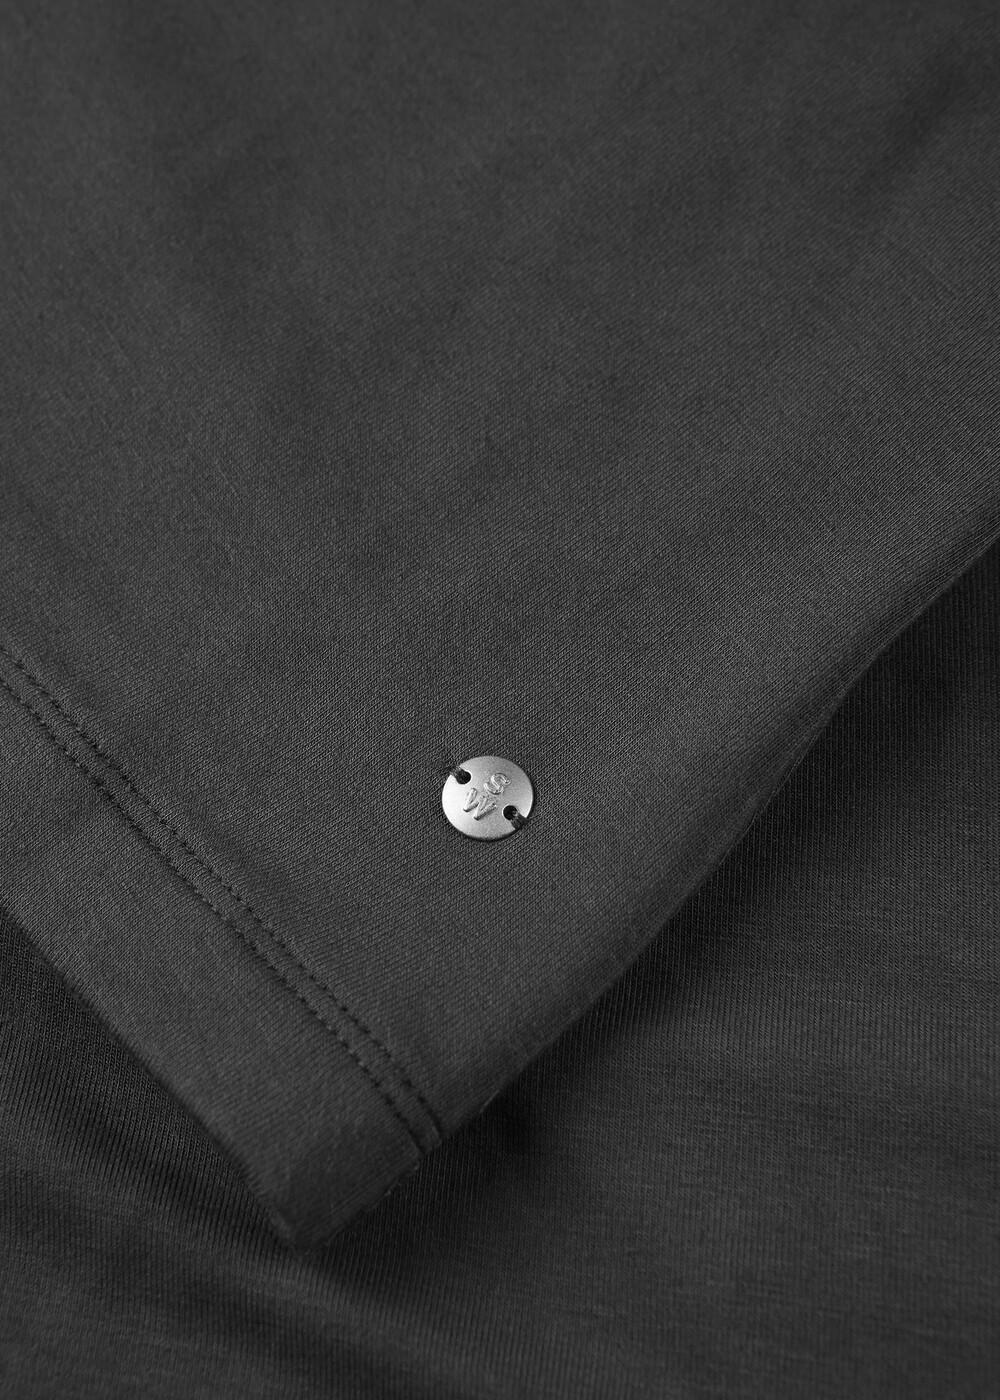 Long Sleeve V-neck T-shirt  main image